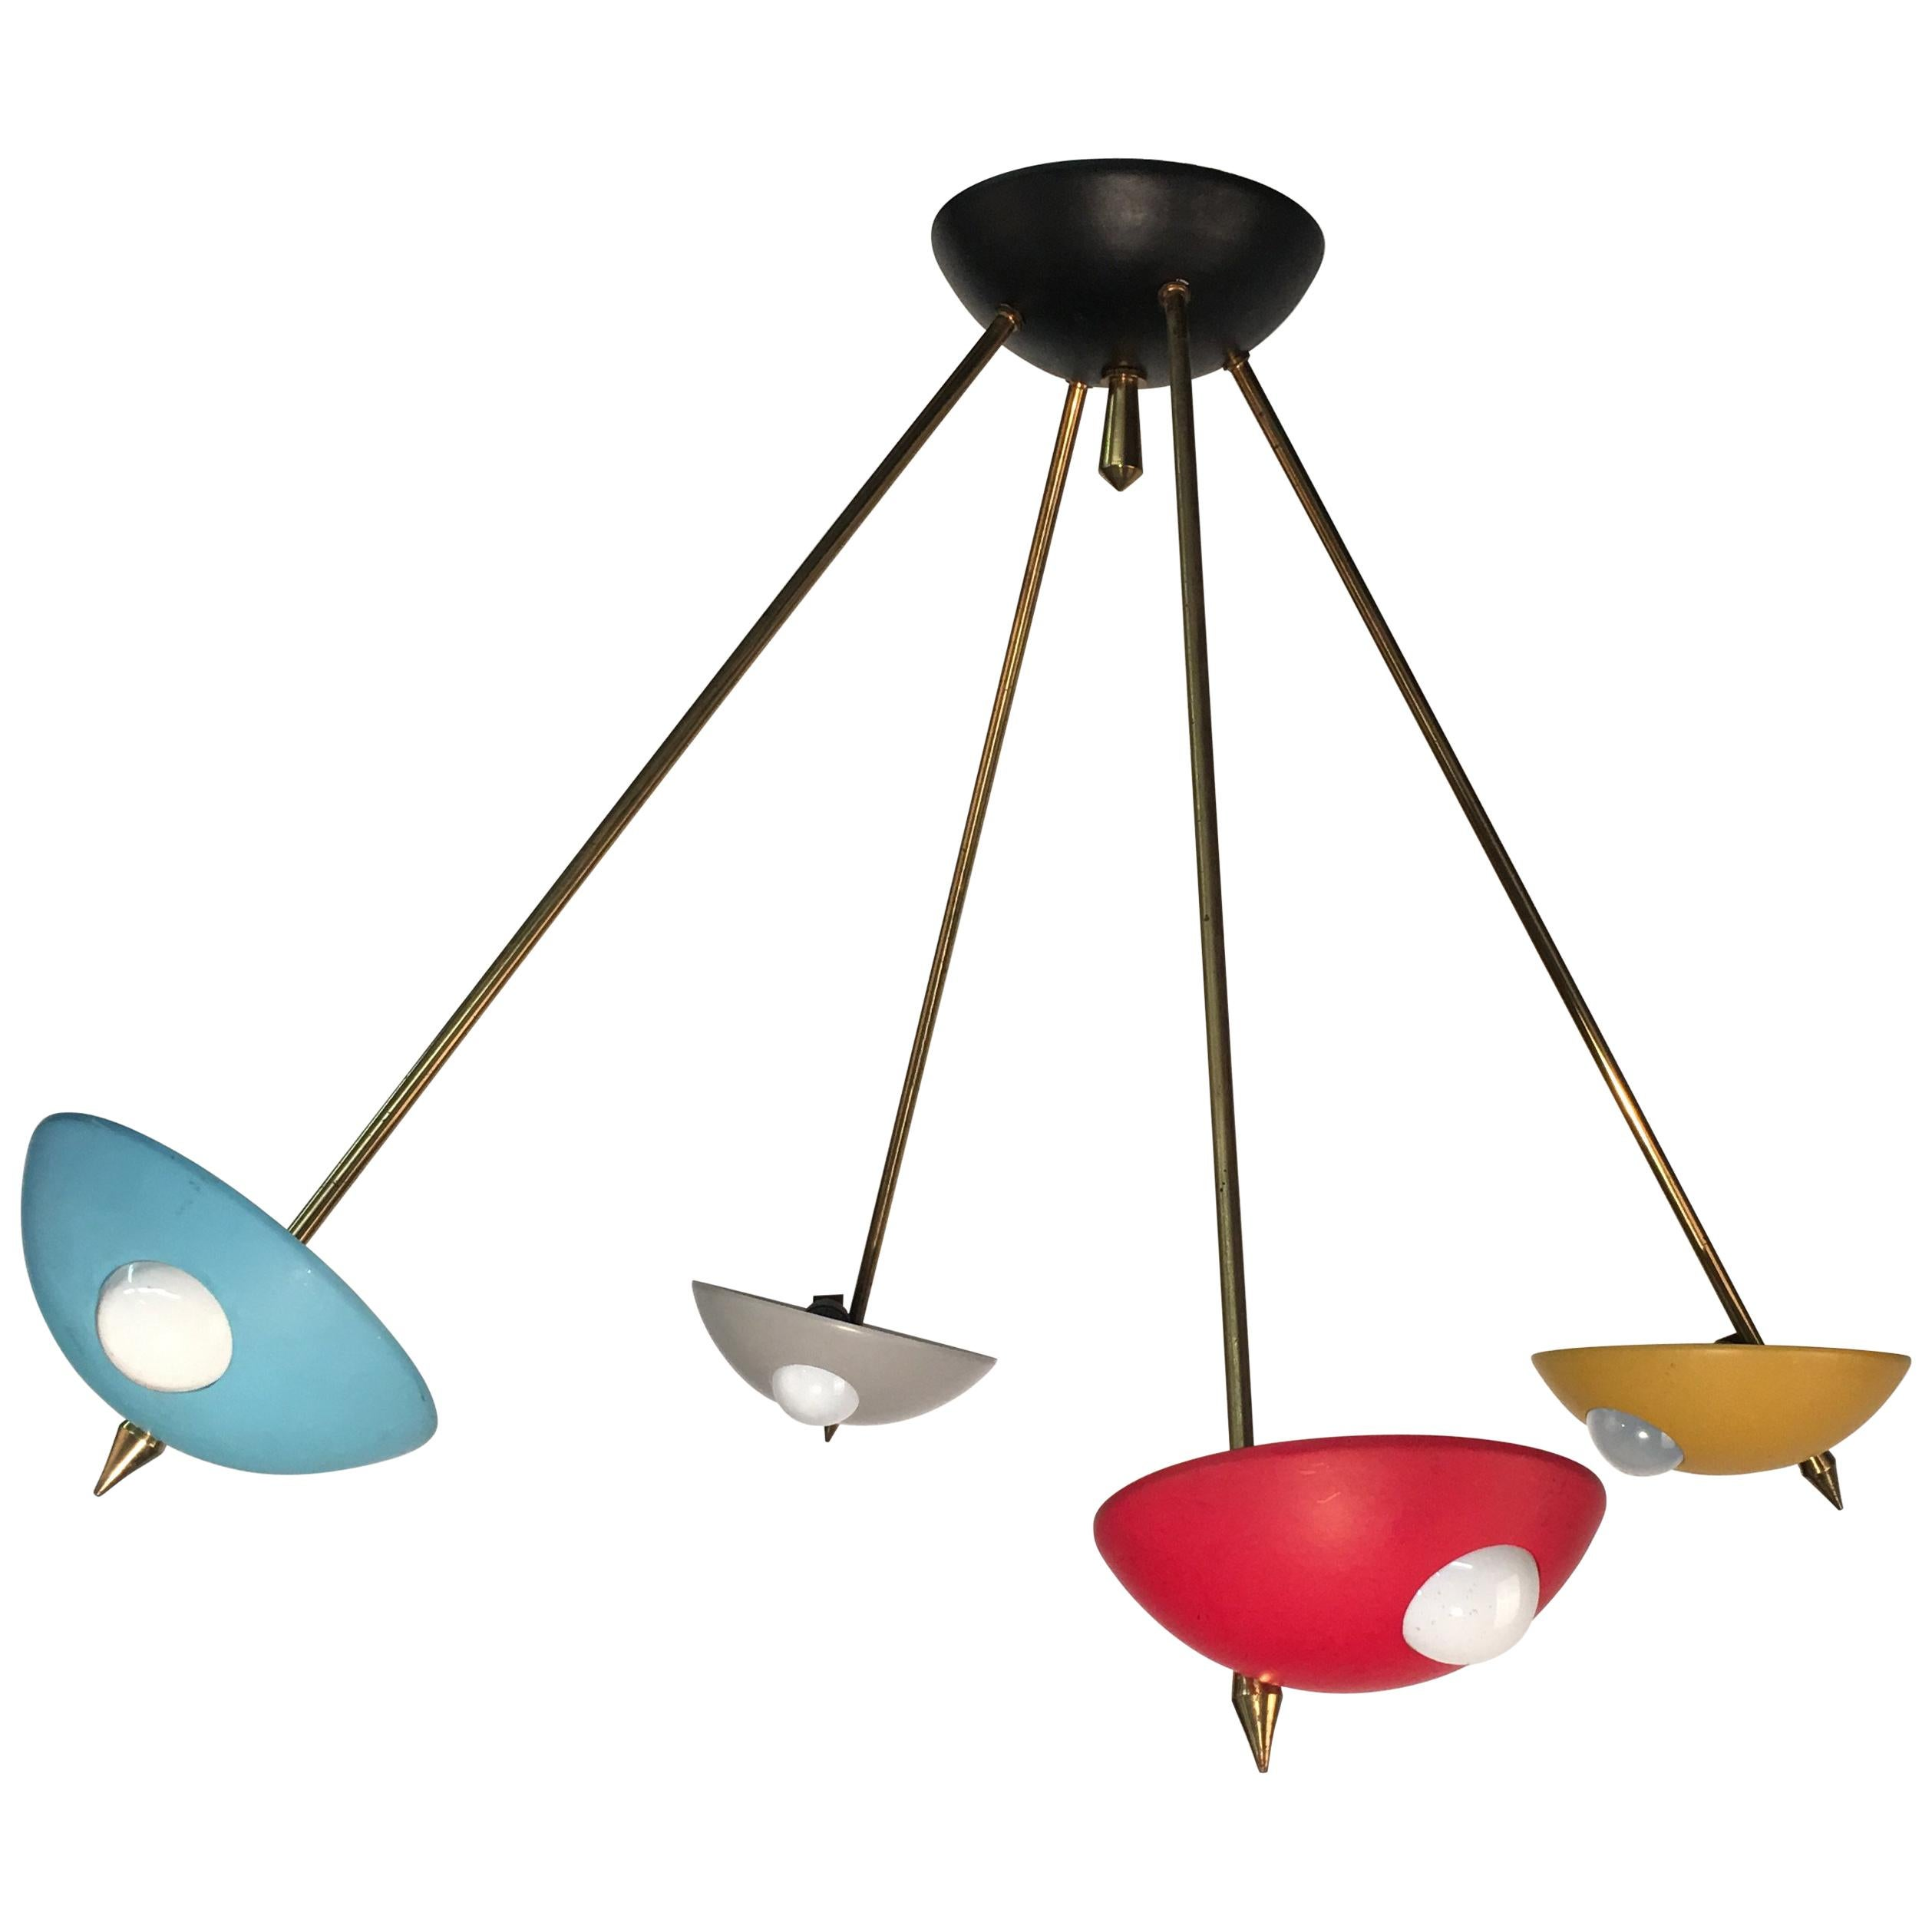 Stilnovo Style Midcentury Italian Brass & Lacquered Aluminium Ceiling Lamp 1950s